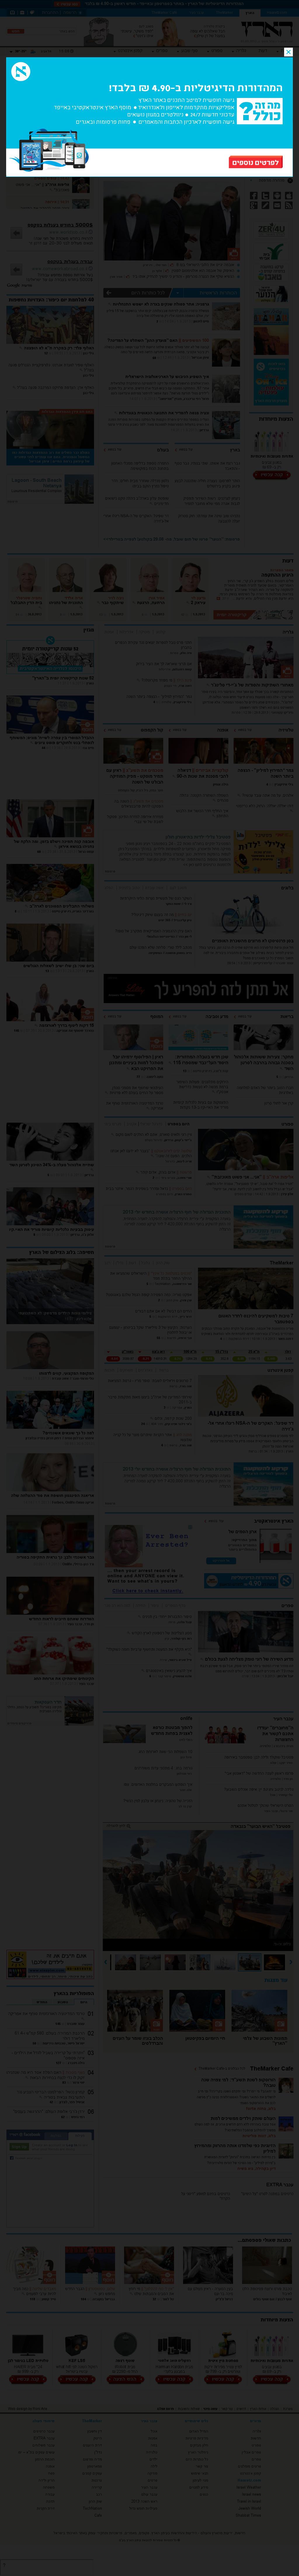 Haaretz at Sunday Sept. 1, 2013, 12:08 p.m. UTC